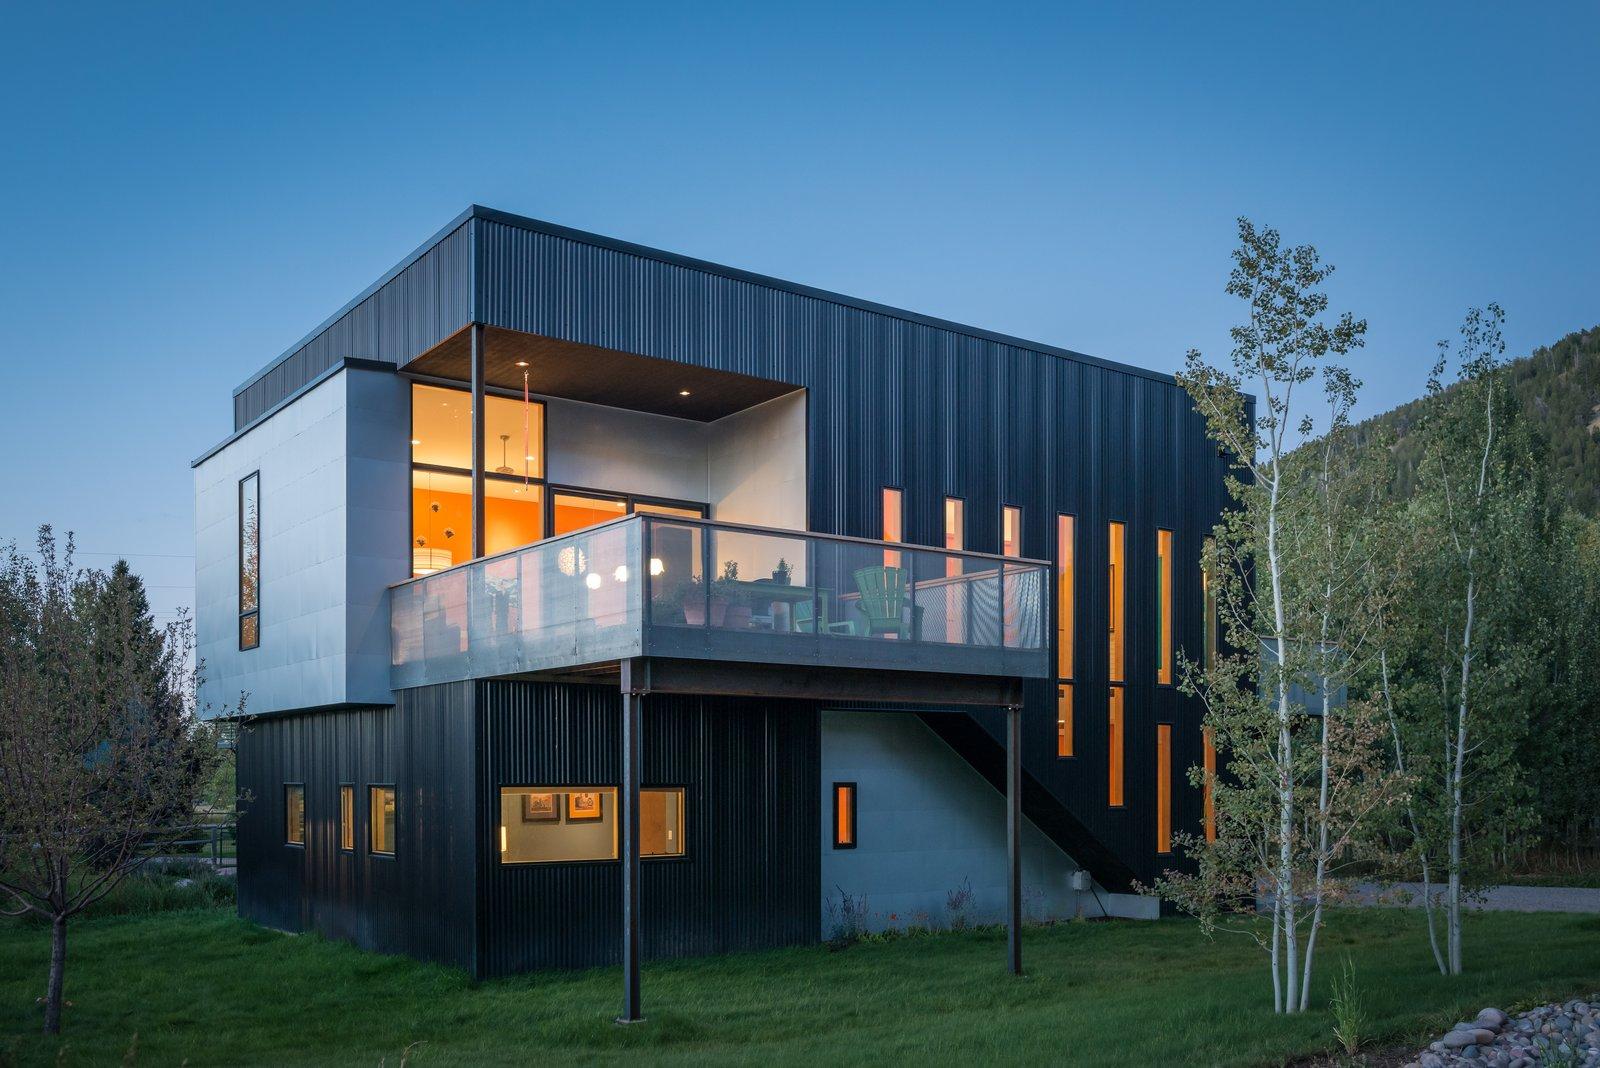 Mishev Residence Carney Logan Burke Architects exterior